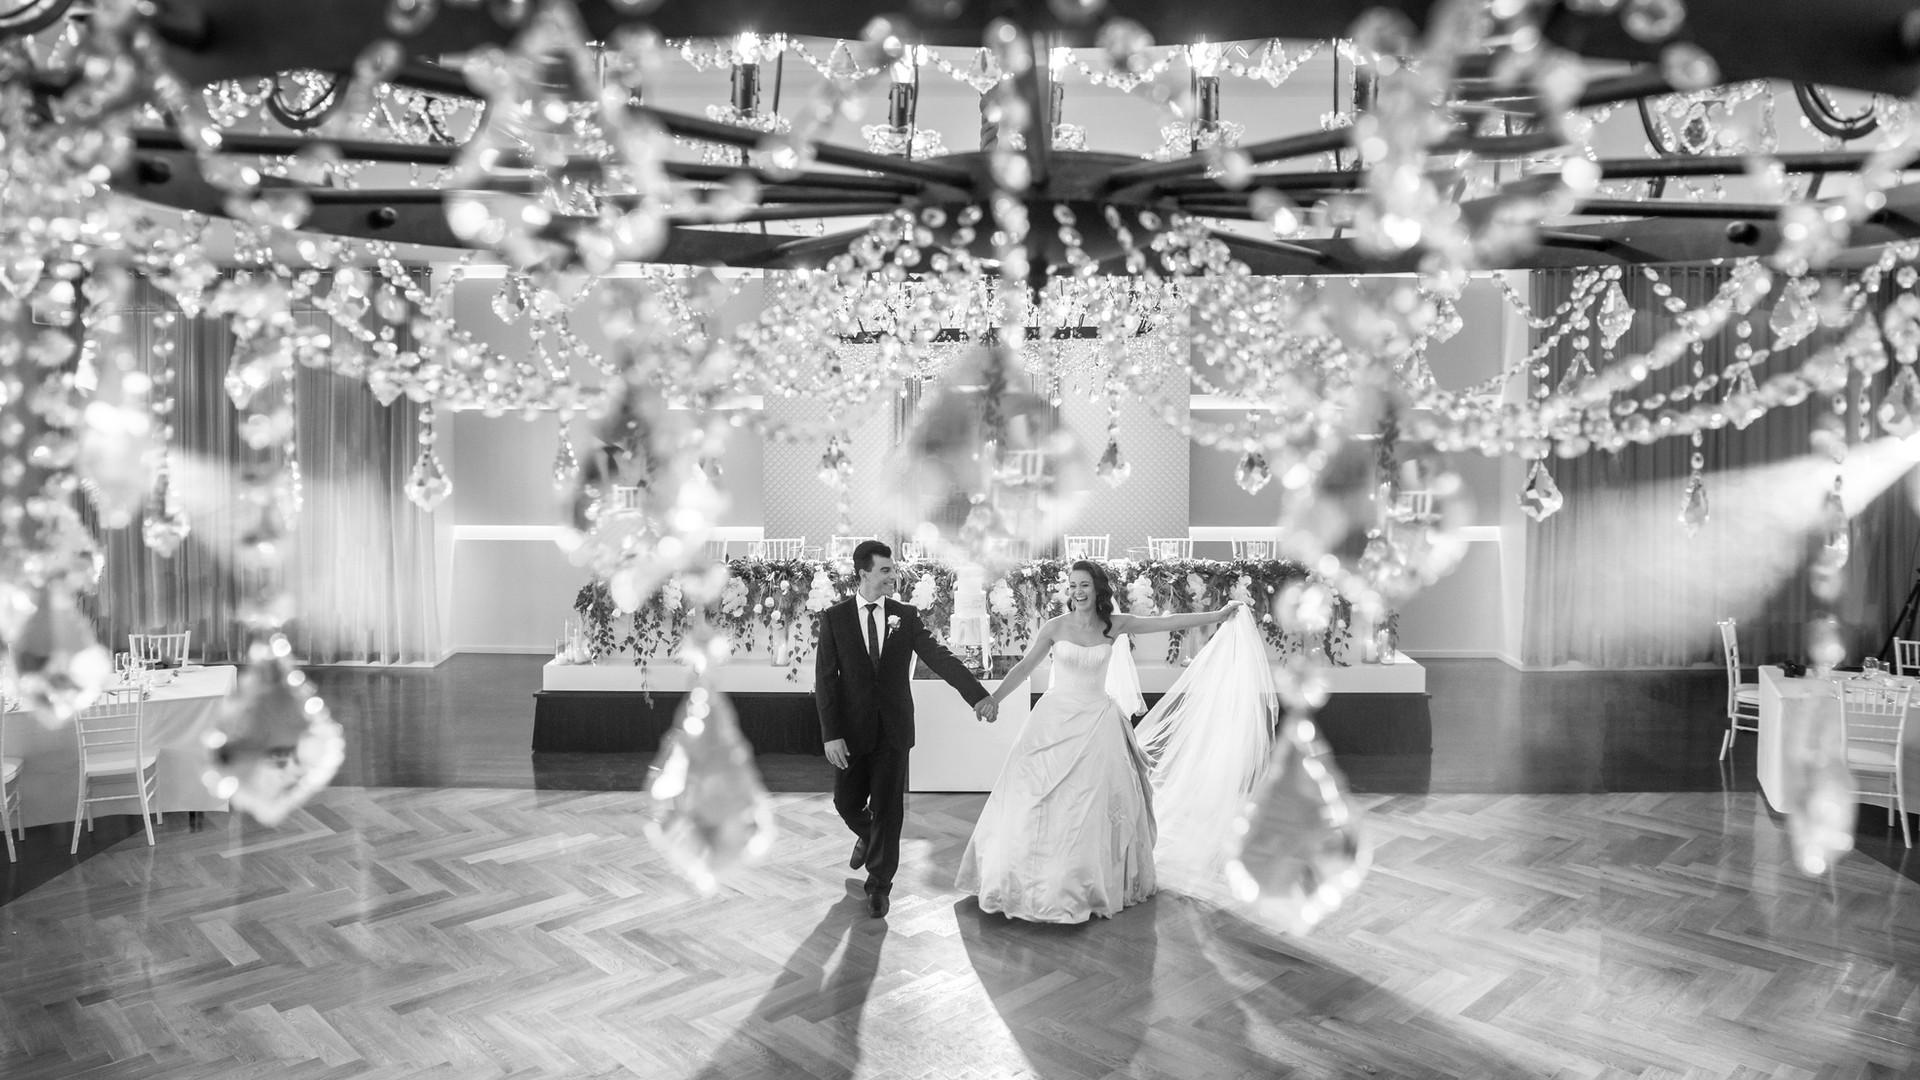 Chandalier | Meadowbank Estate | Wedding Venue | Campbellfield